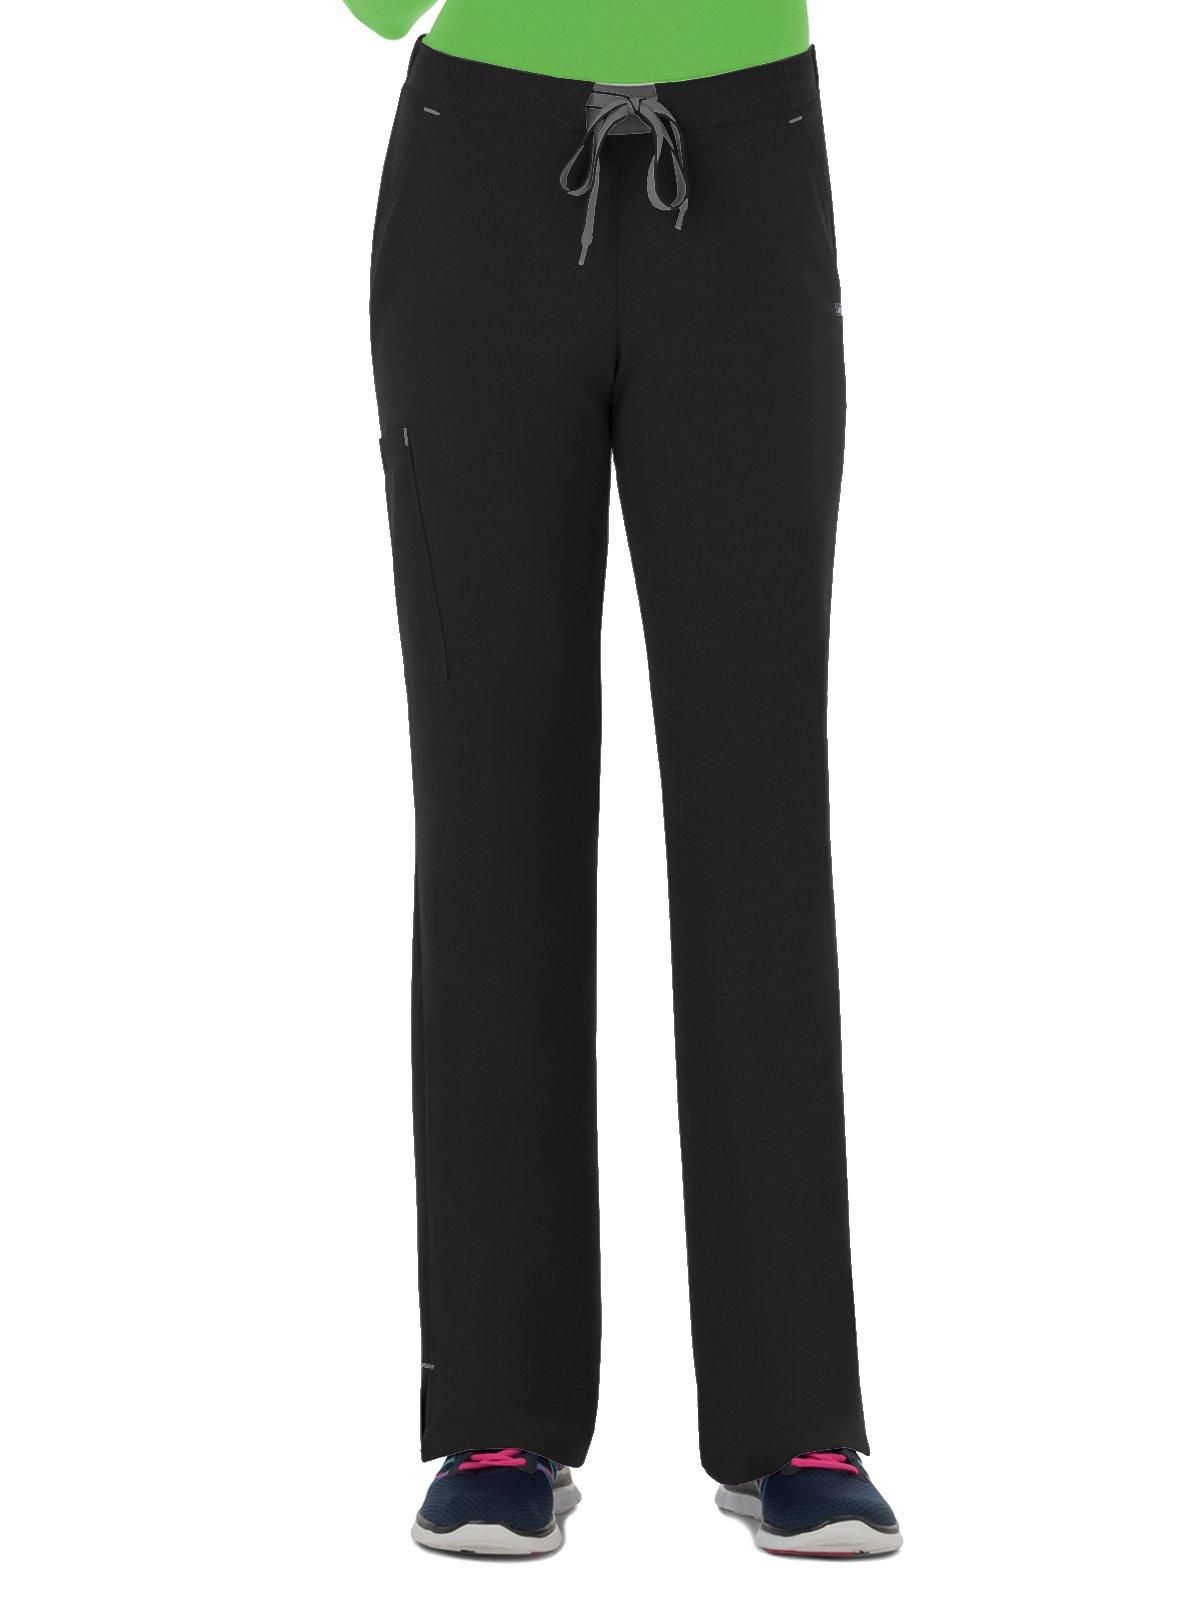 Modern Fit Collection by Jockey Women's Convertible Drawstring Scrub Pant Medium Petite Black